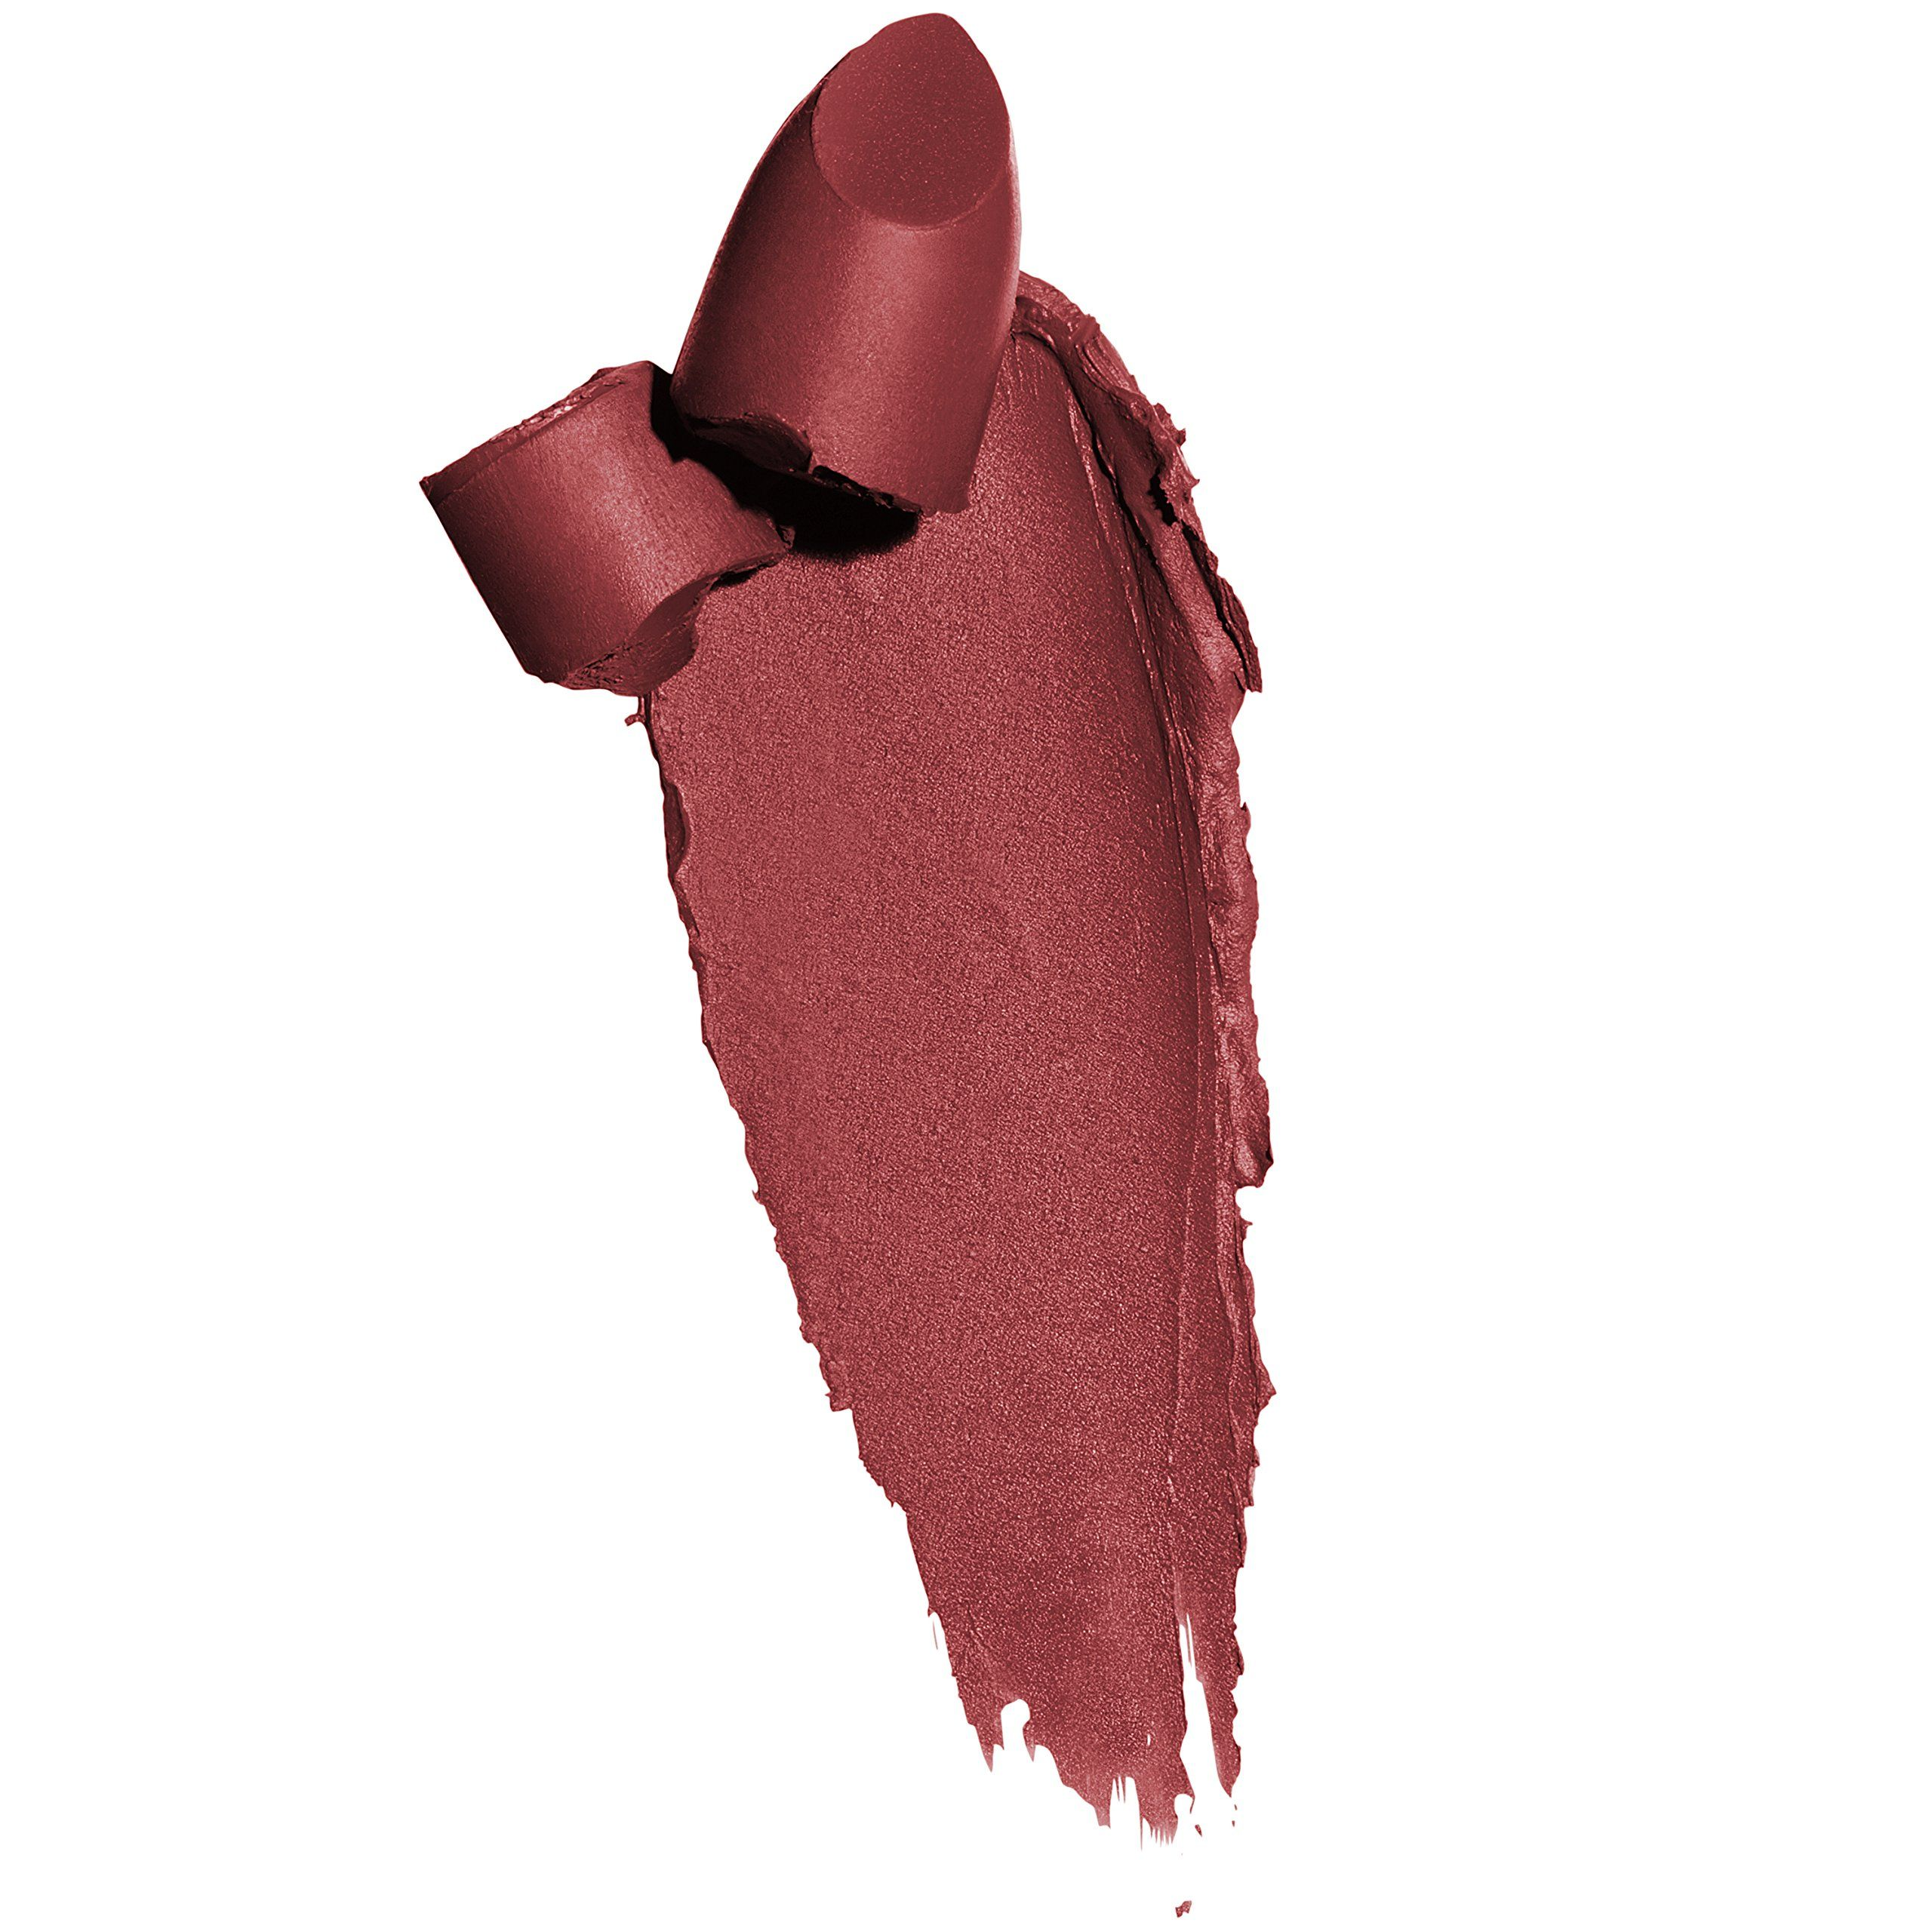 Maybelline Color Sensational Powder Matte Lipstick Cruel Ruby 0 15 Oz See This Great P Powder Matte Lipstick Maybelline Color Sensational Color Sensational